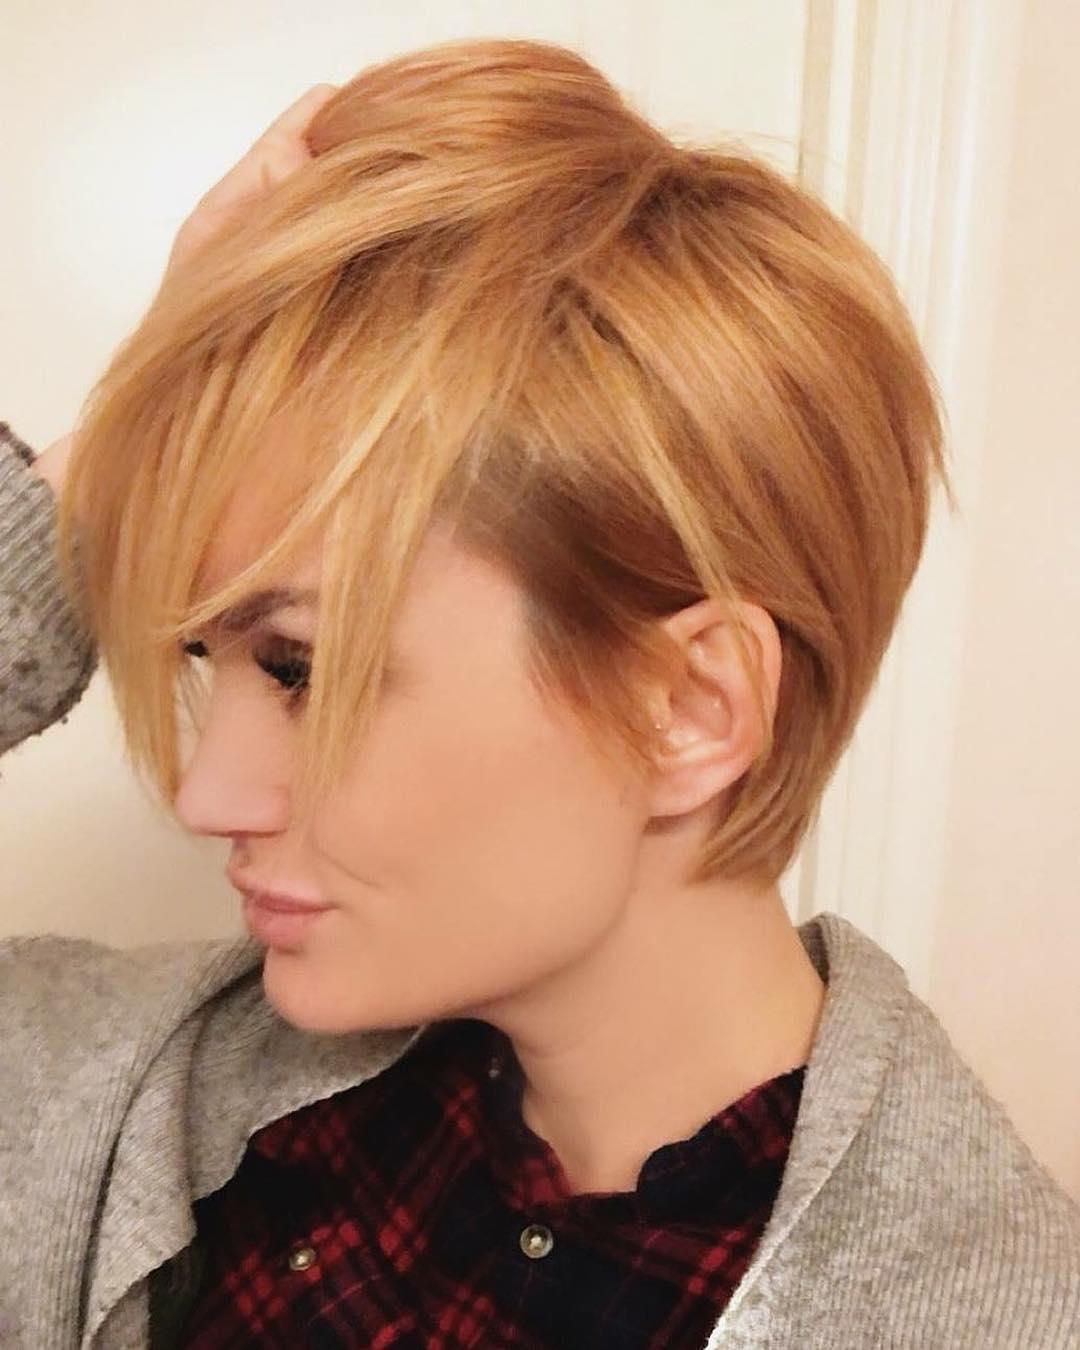 capelli rossi naturali